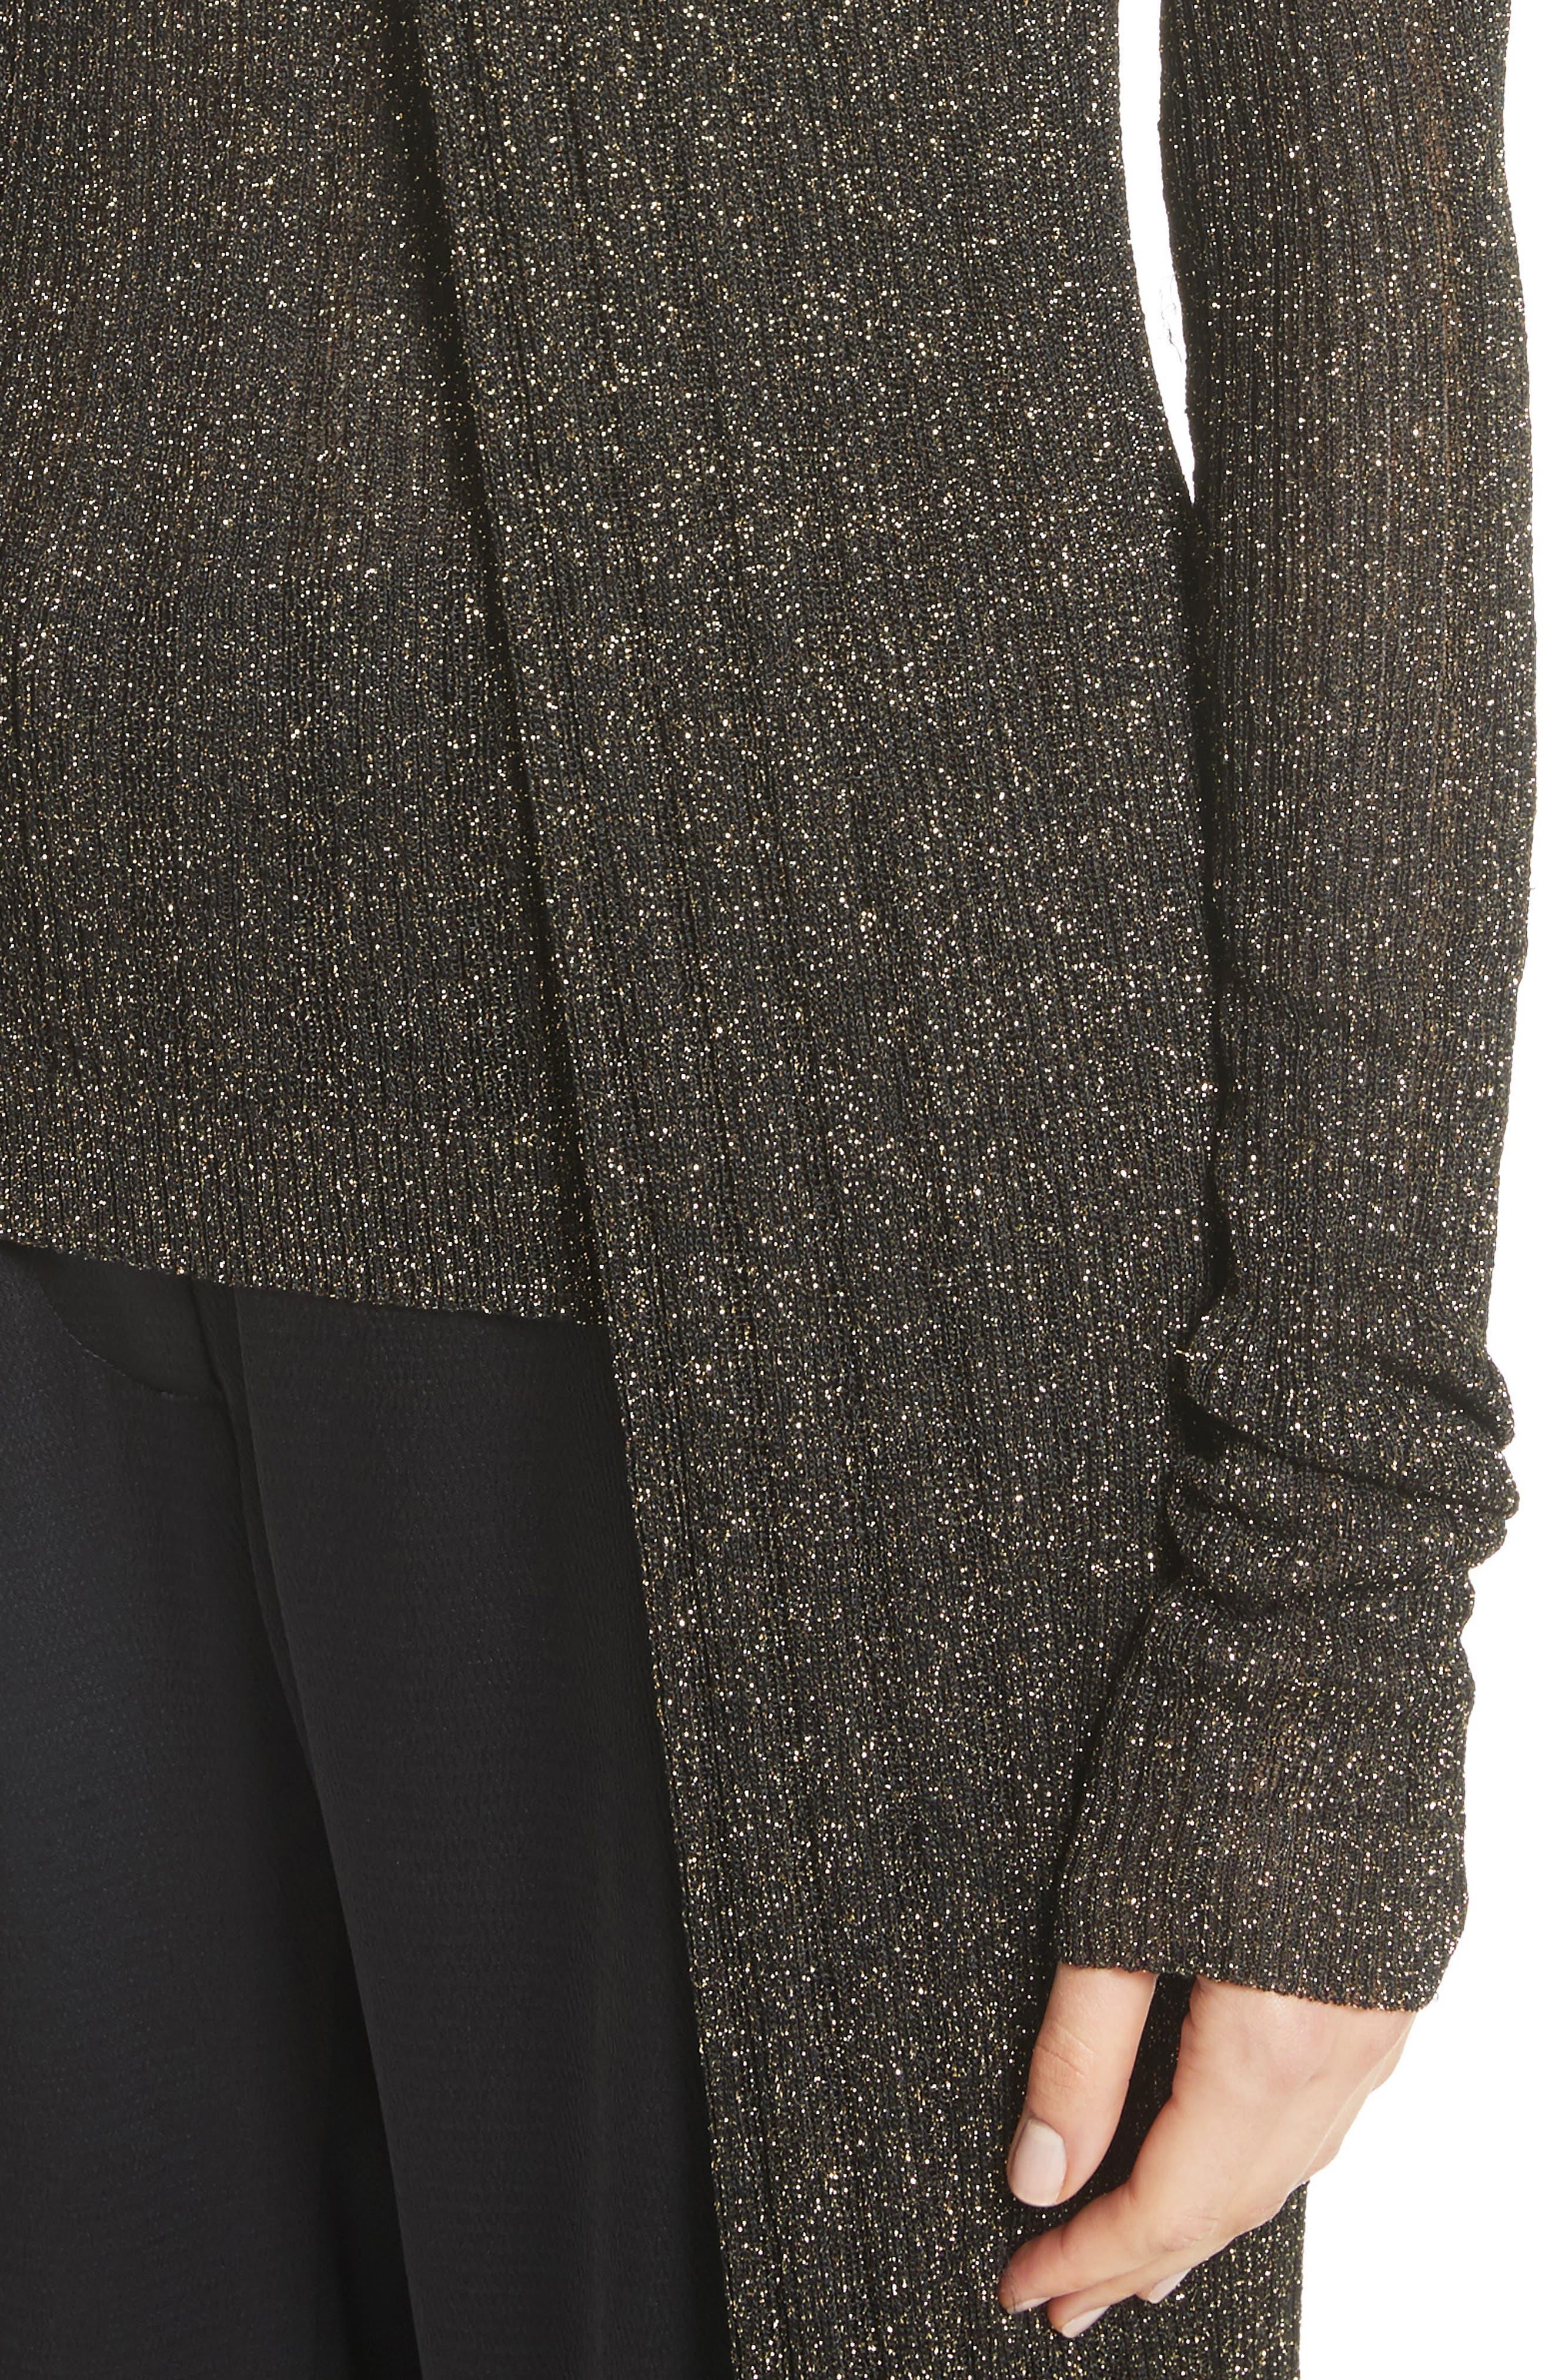 LaSalle Metallic Knit Long Cardigan,                             Alternate thumbnail 4, color,                             011